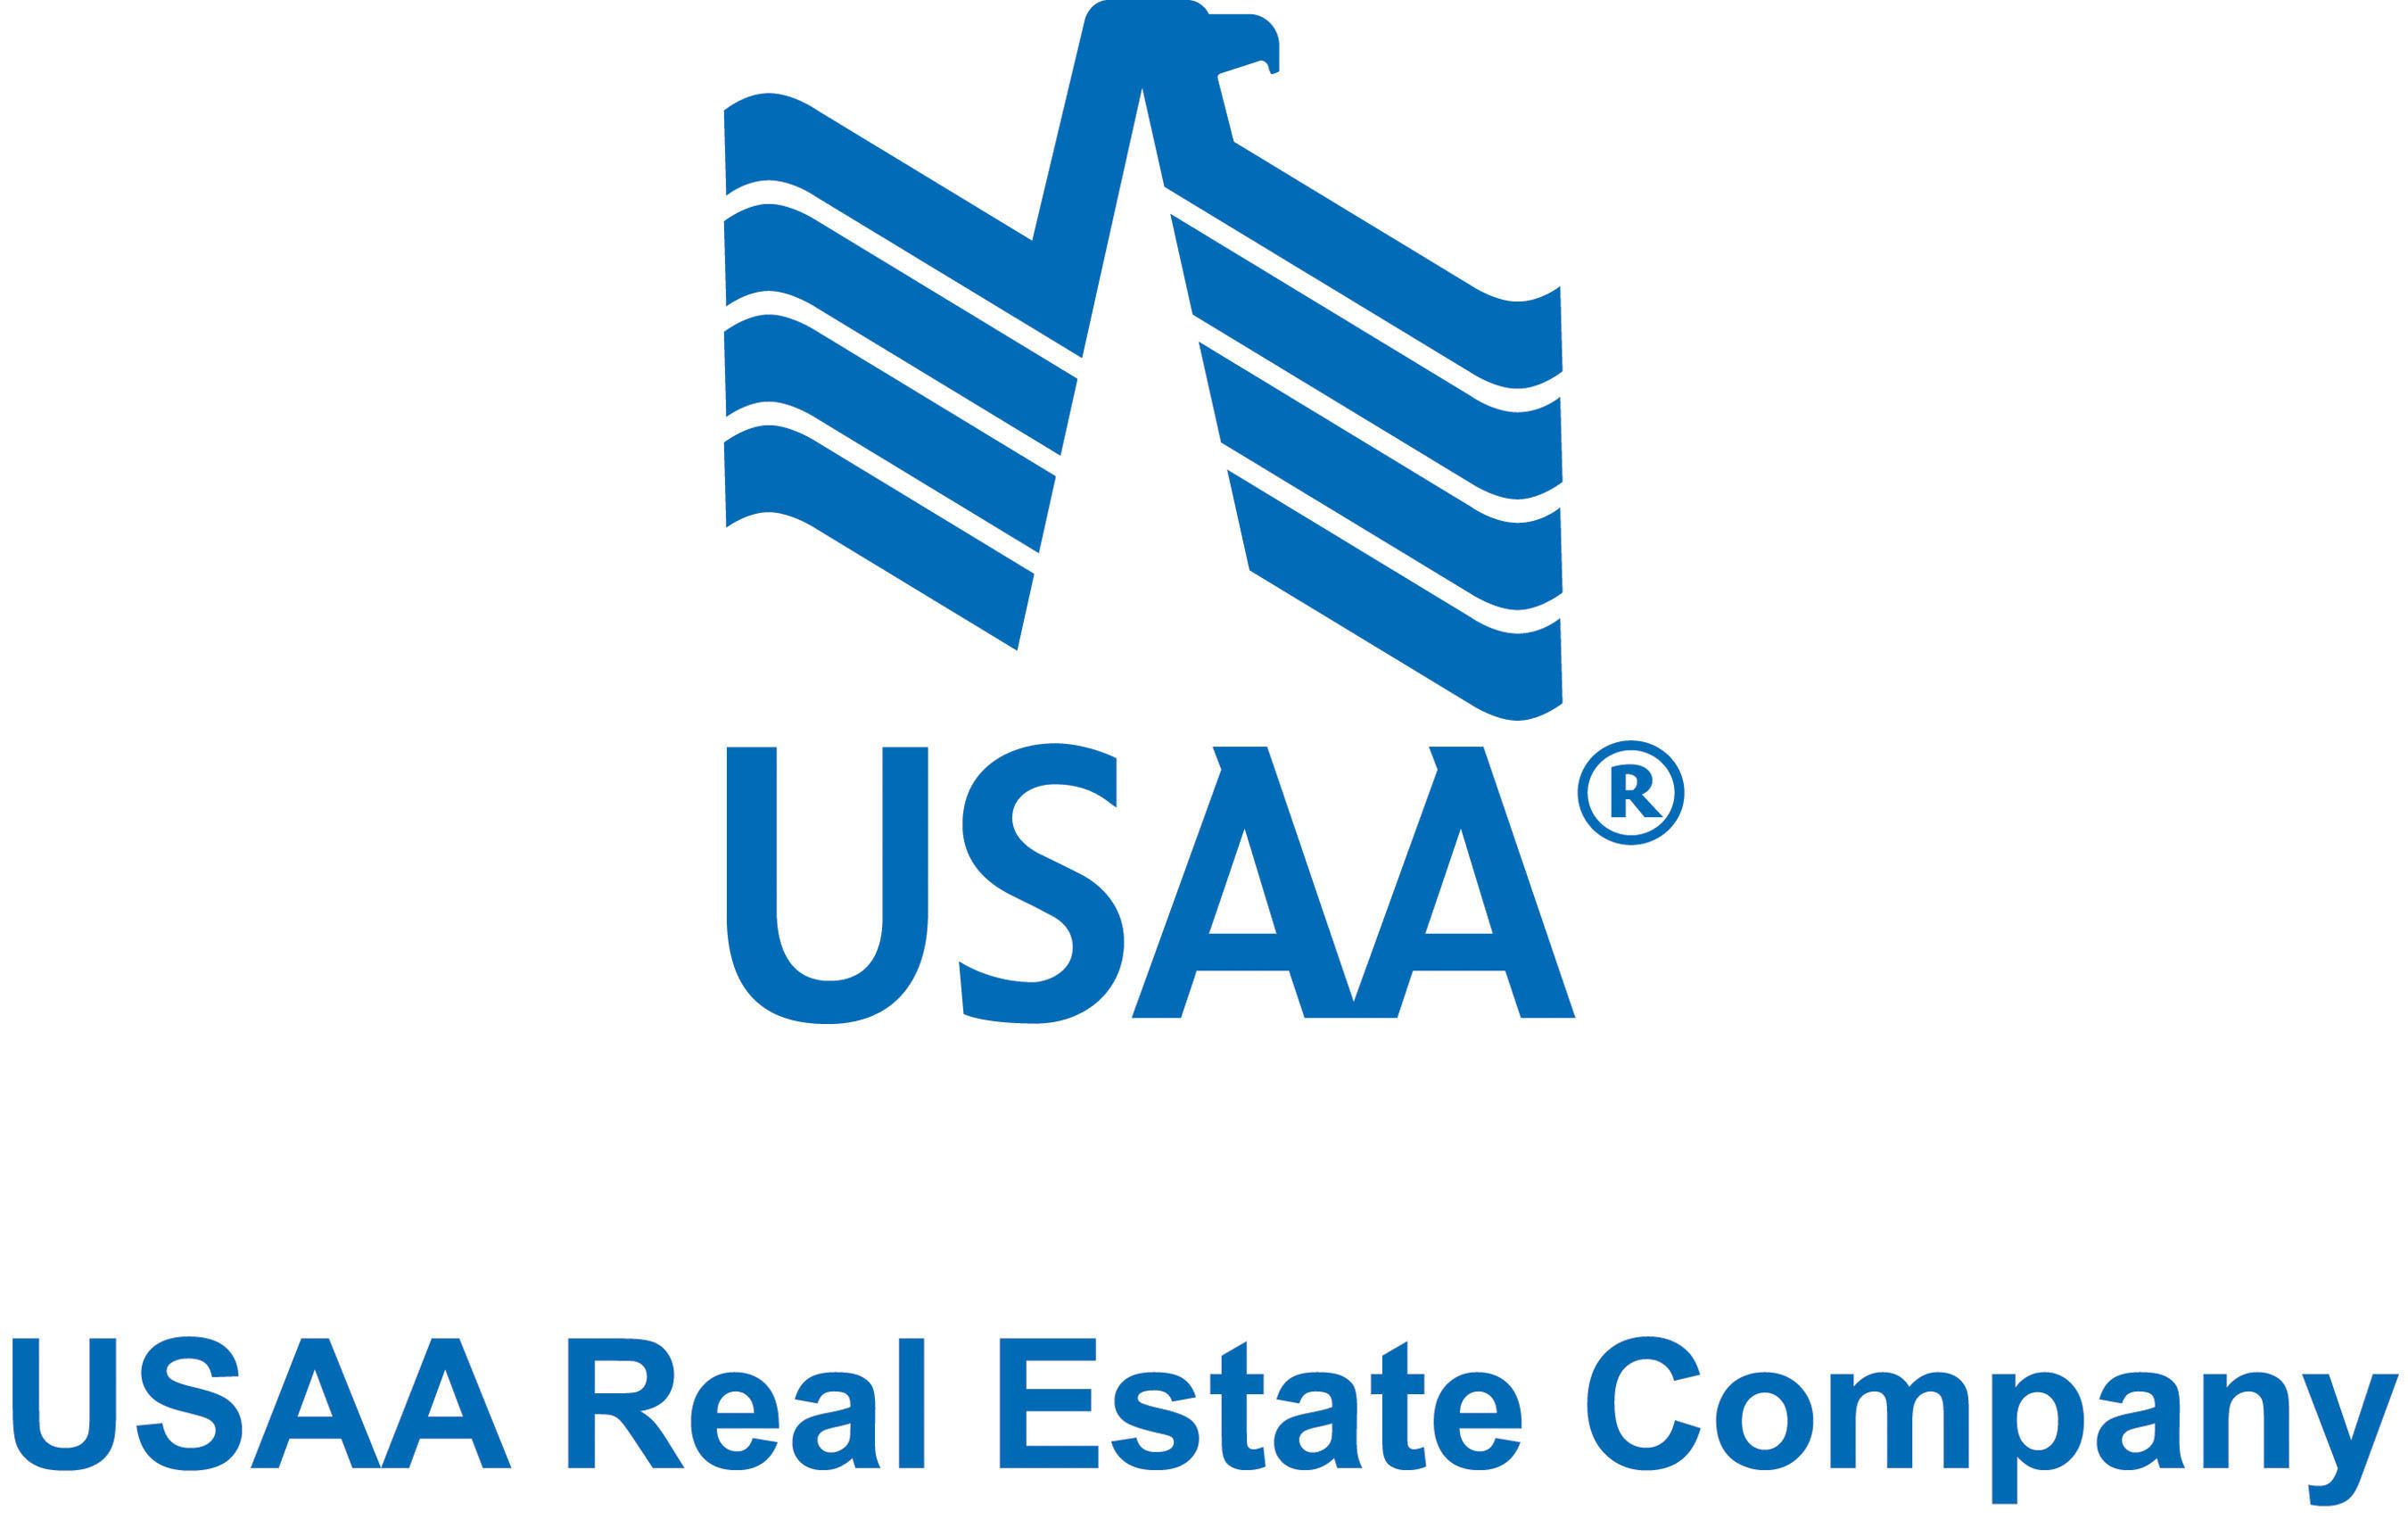 Usaa Real Estate Company Executive Managing Director Susan Wallace